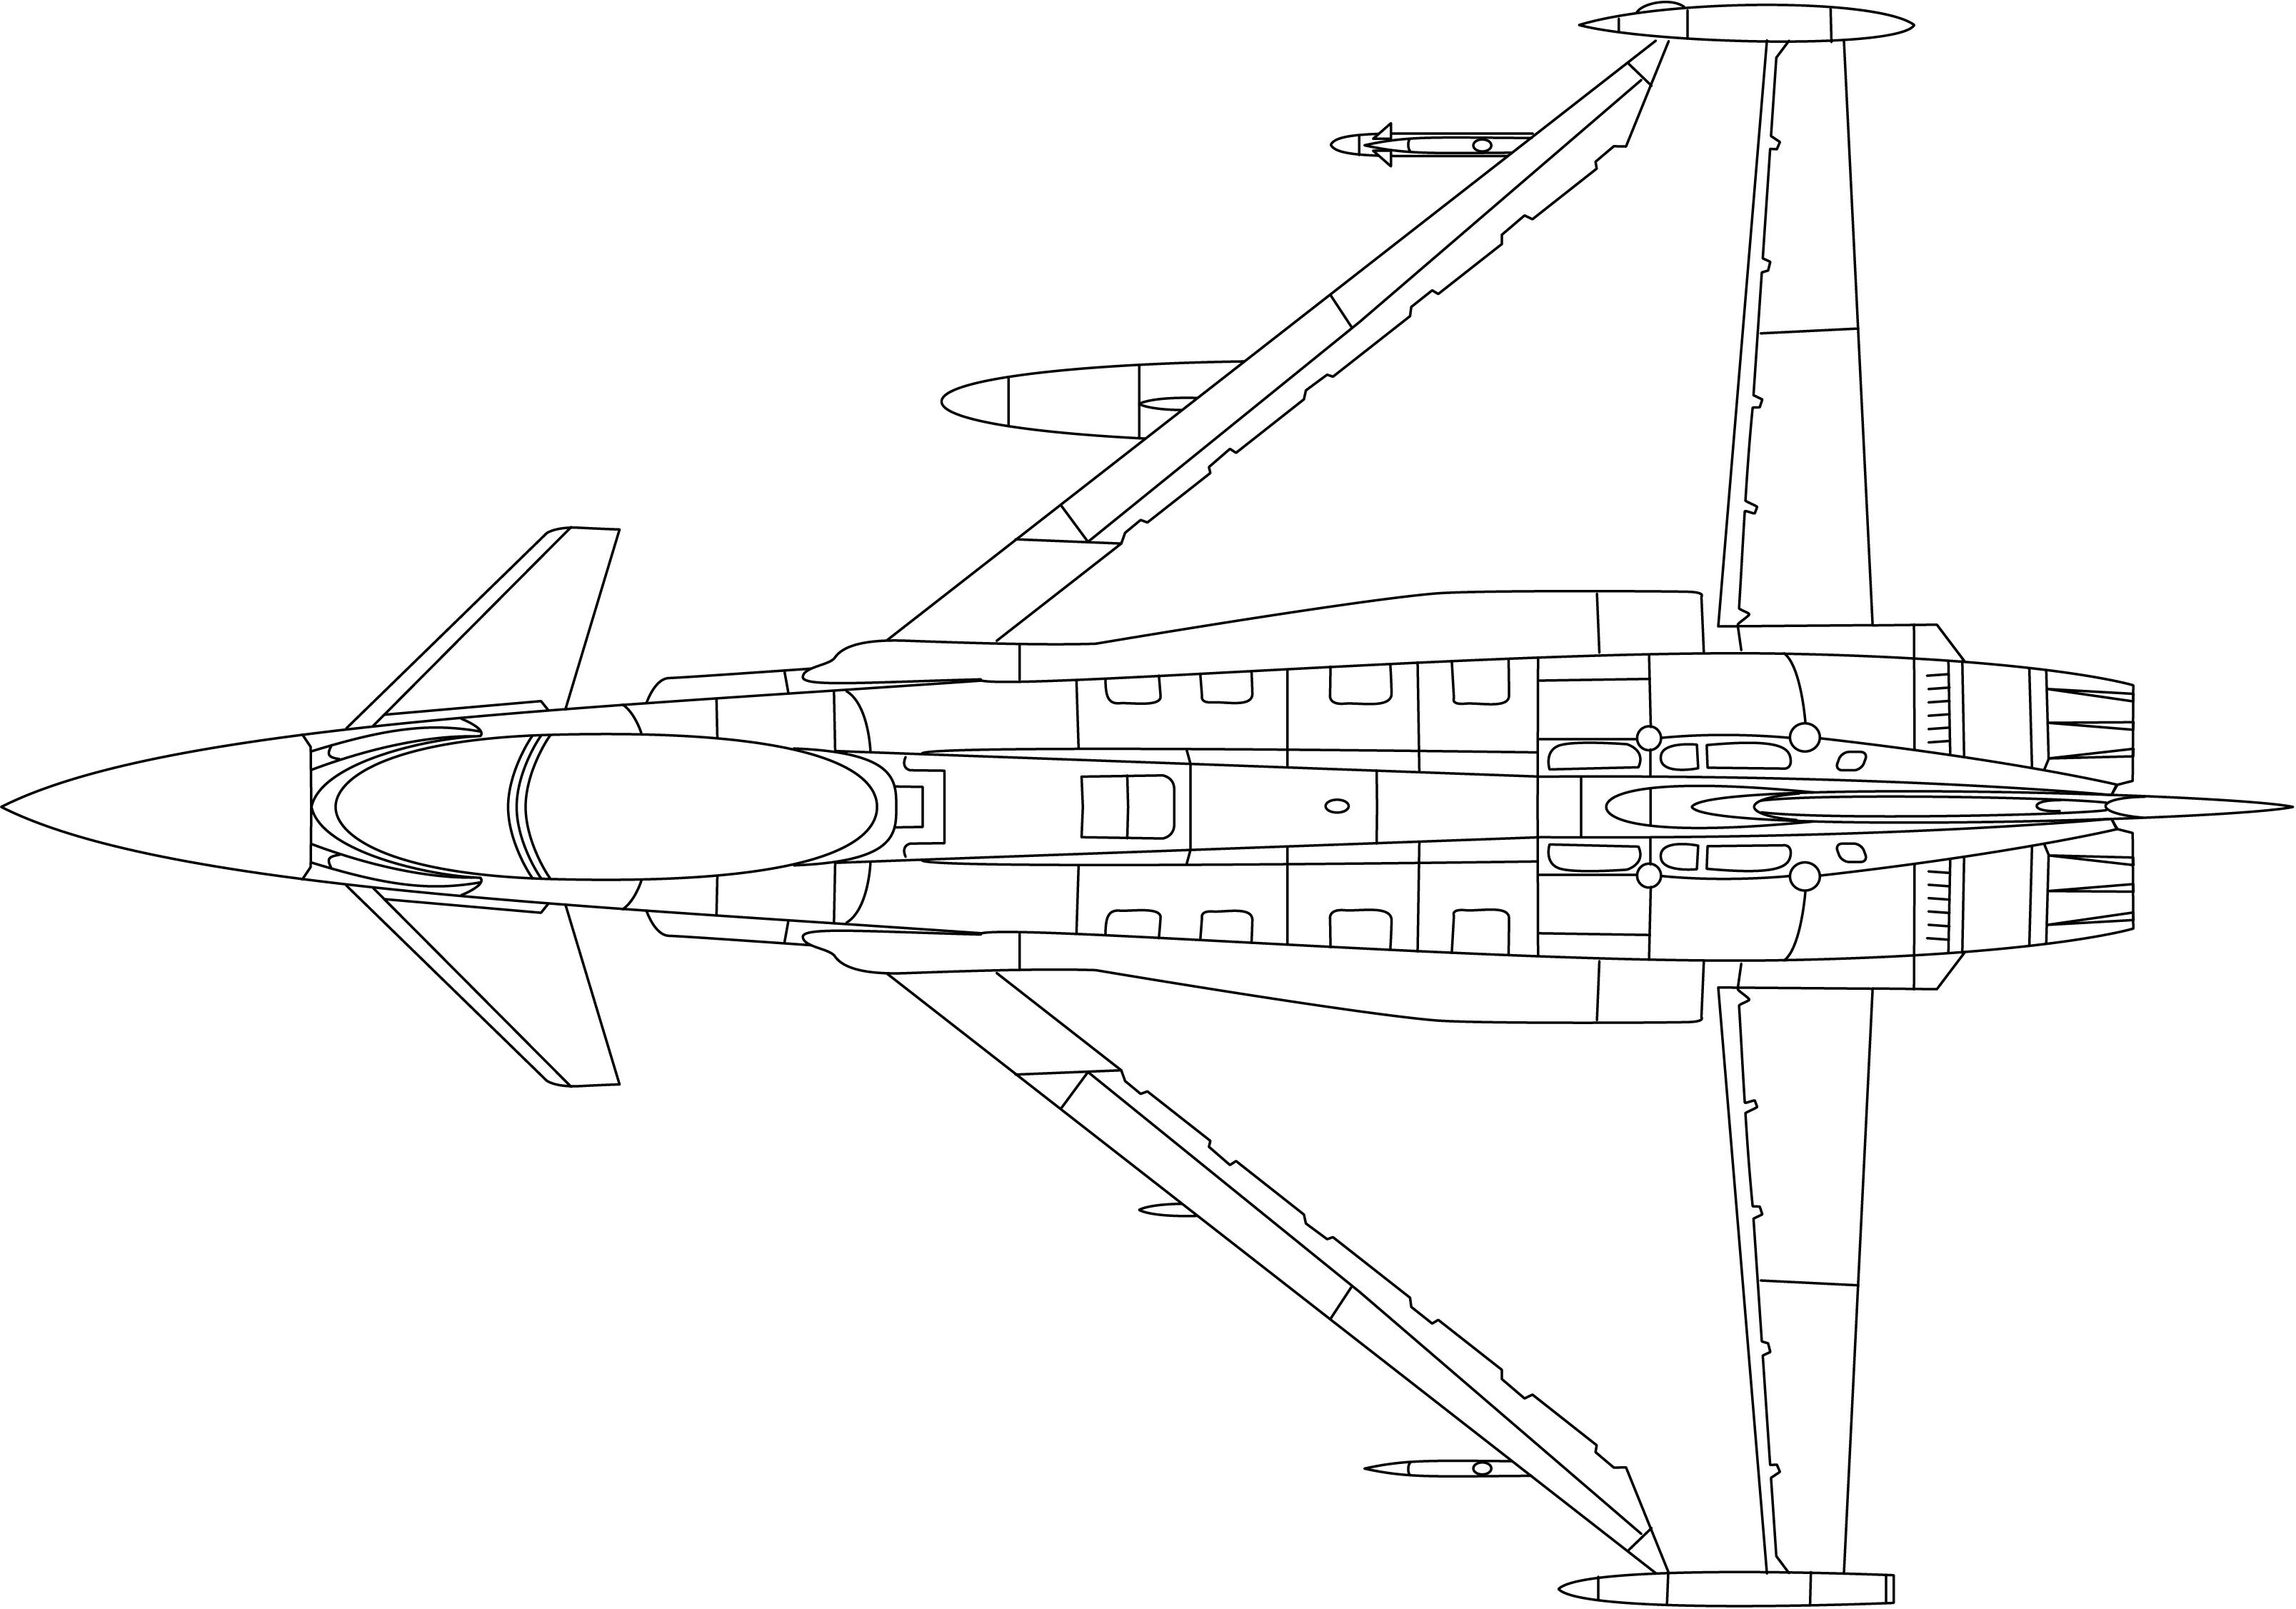 3d Modelling The Jet